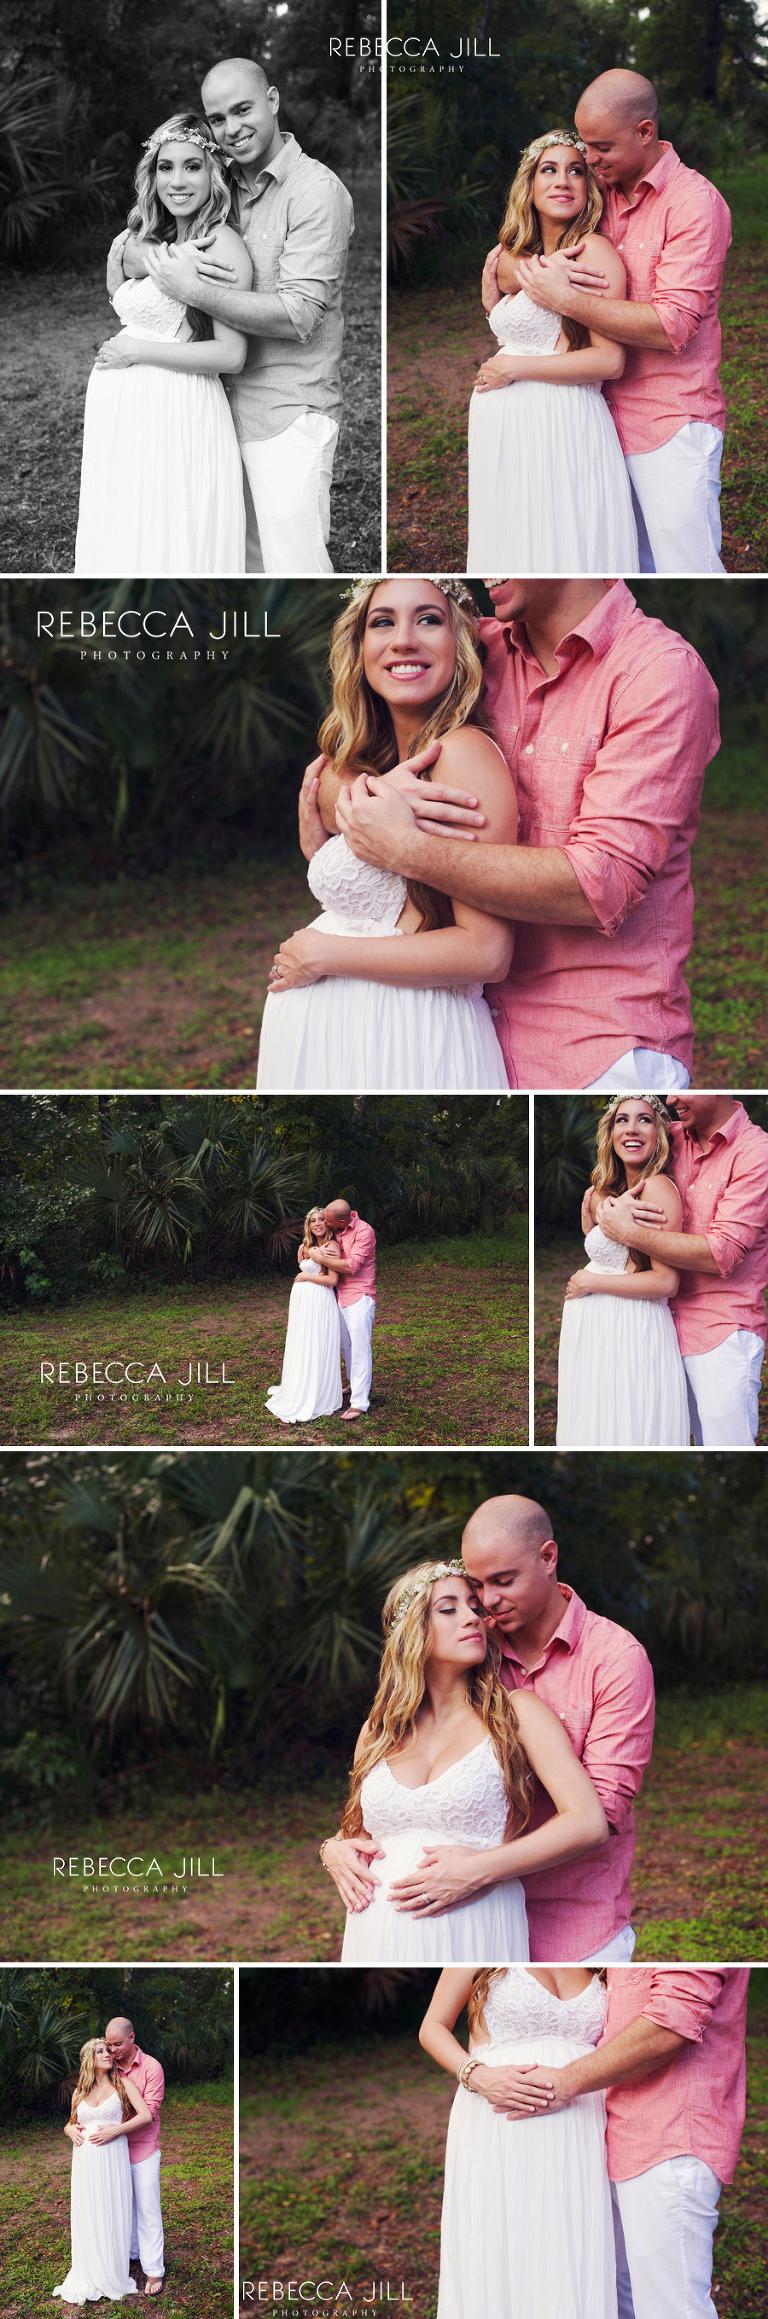 Central Florida Underwater Maternity Photographer